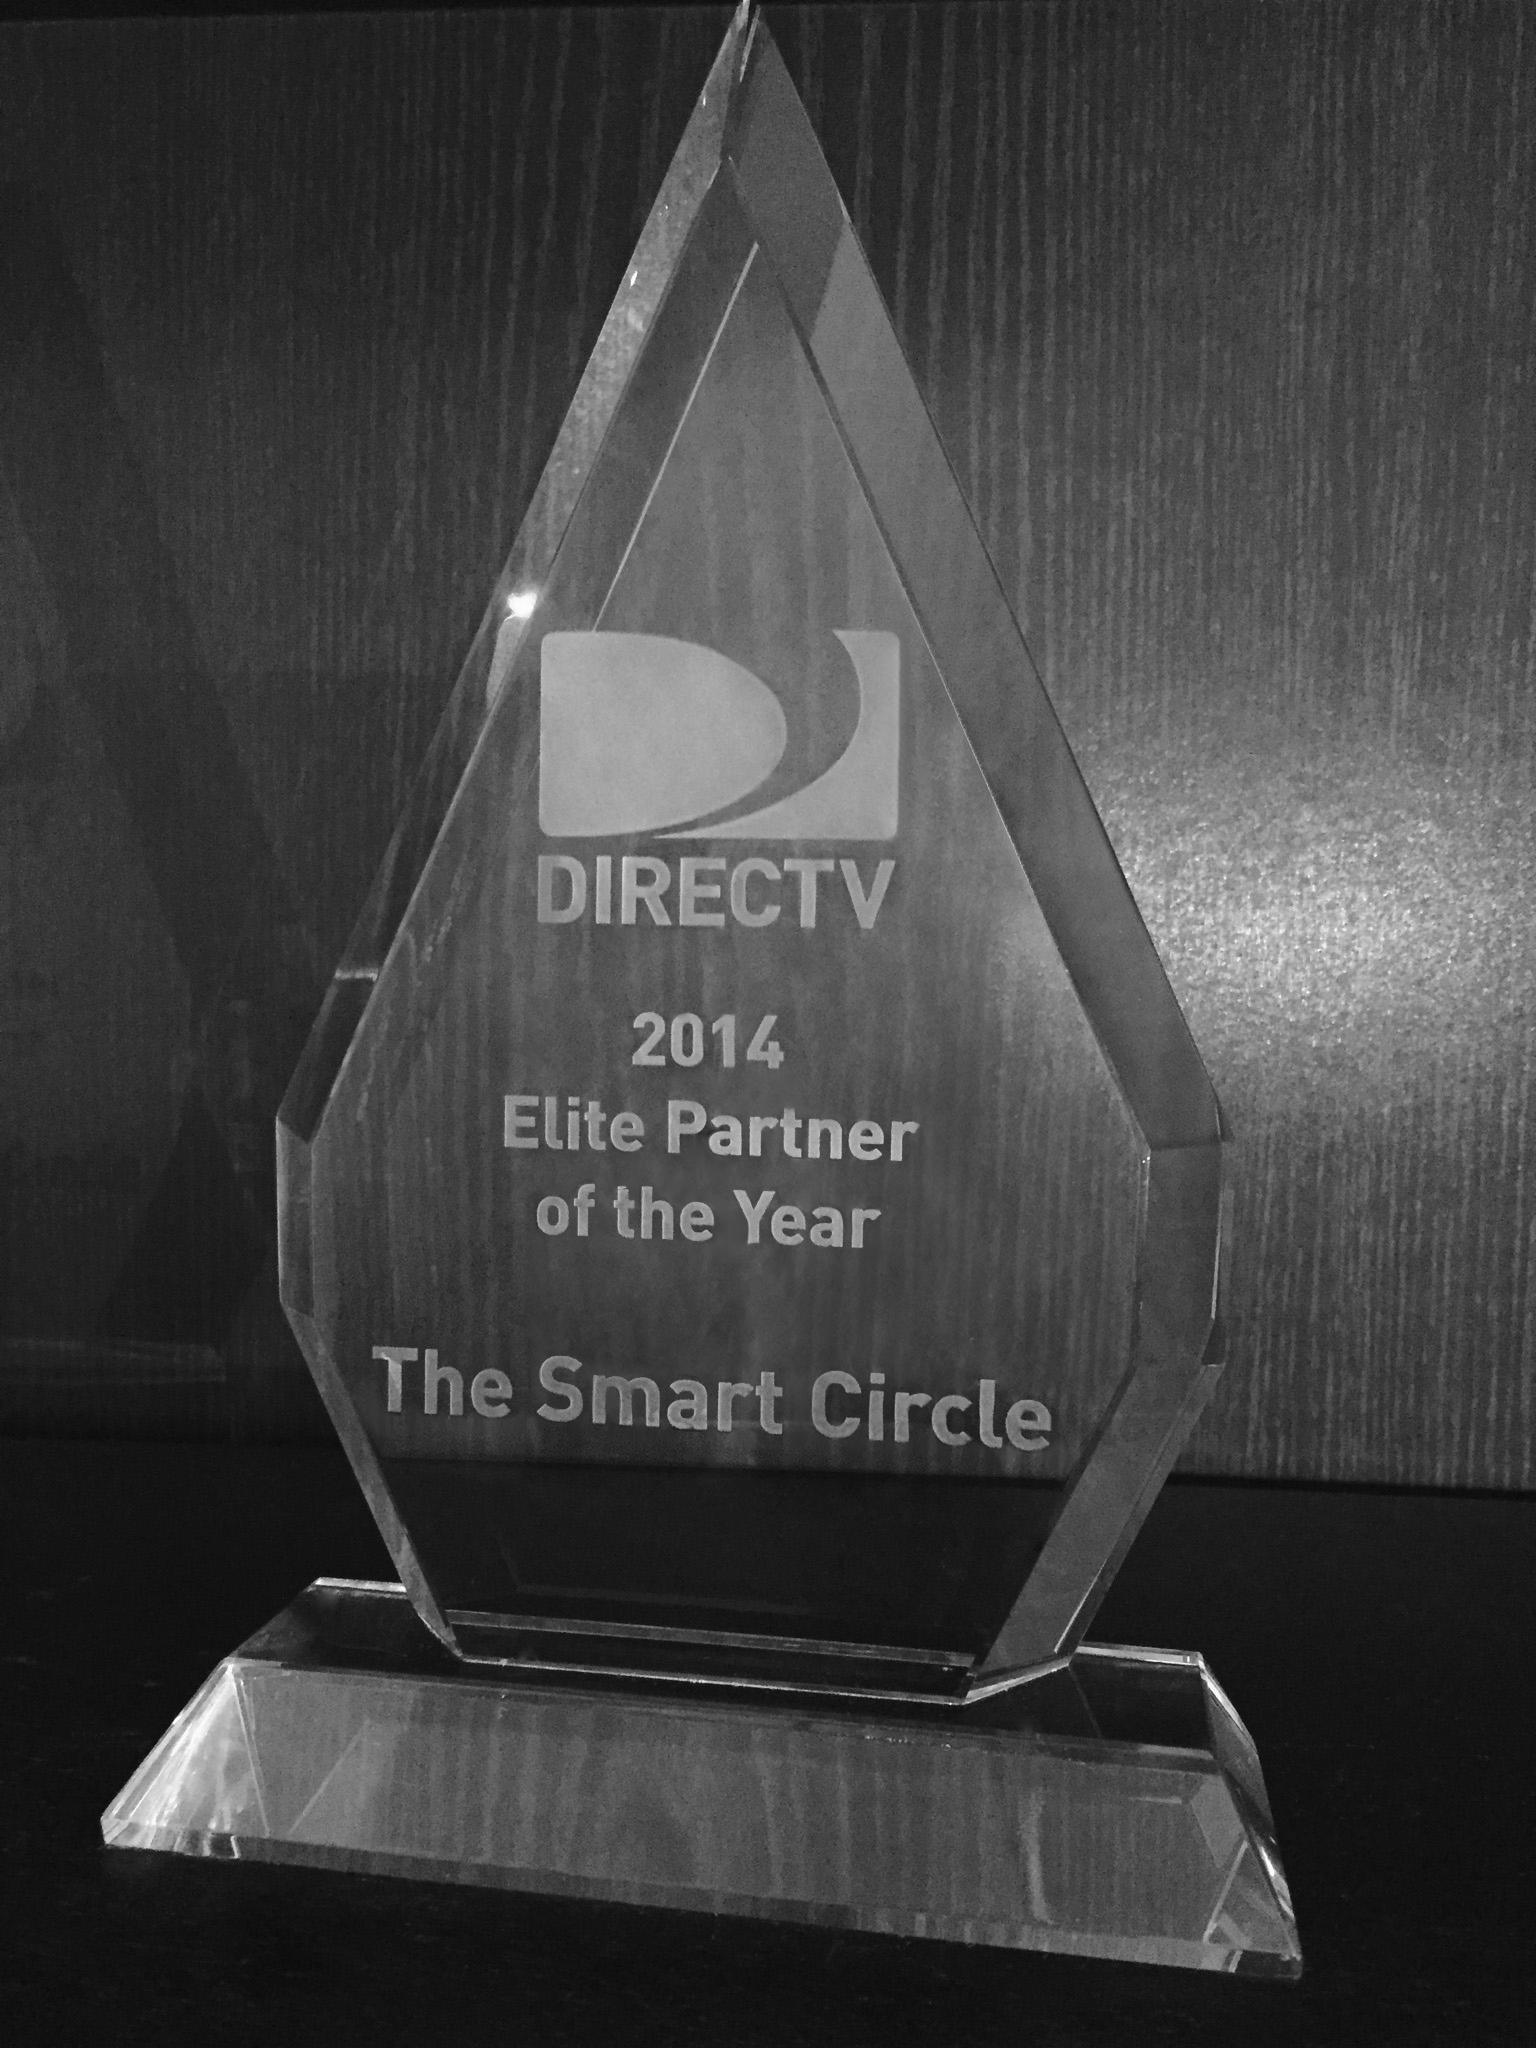 DIRECTV Award 2014